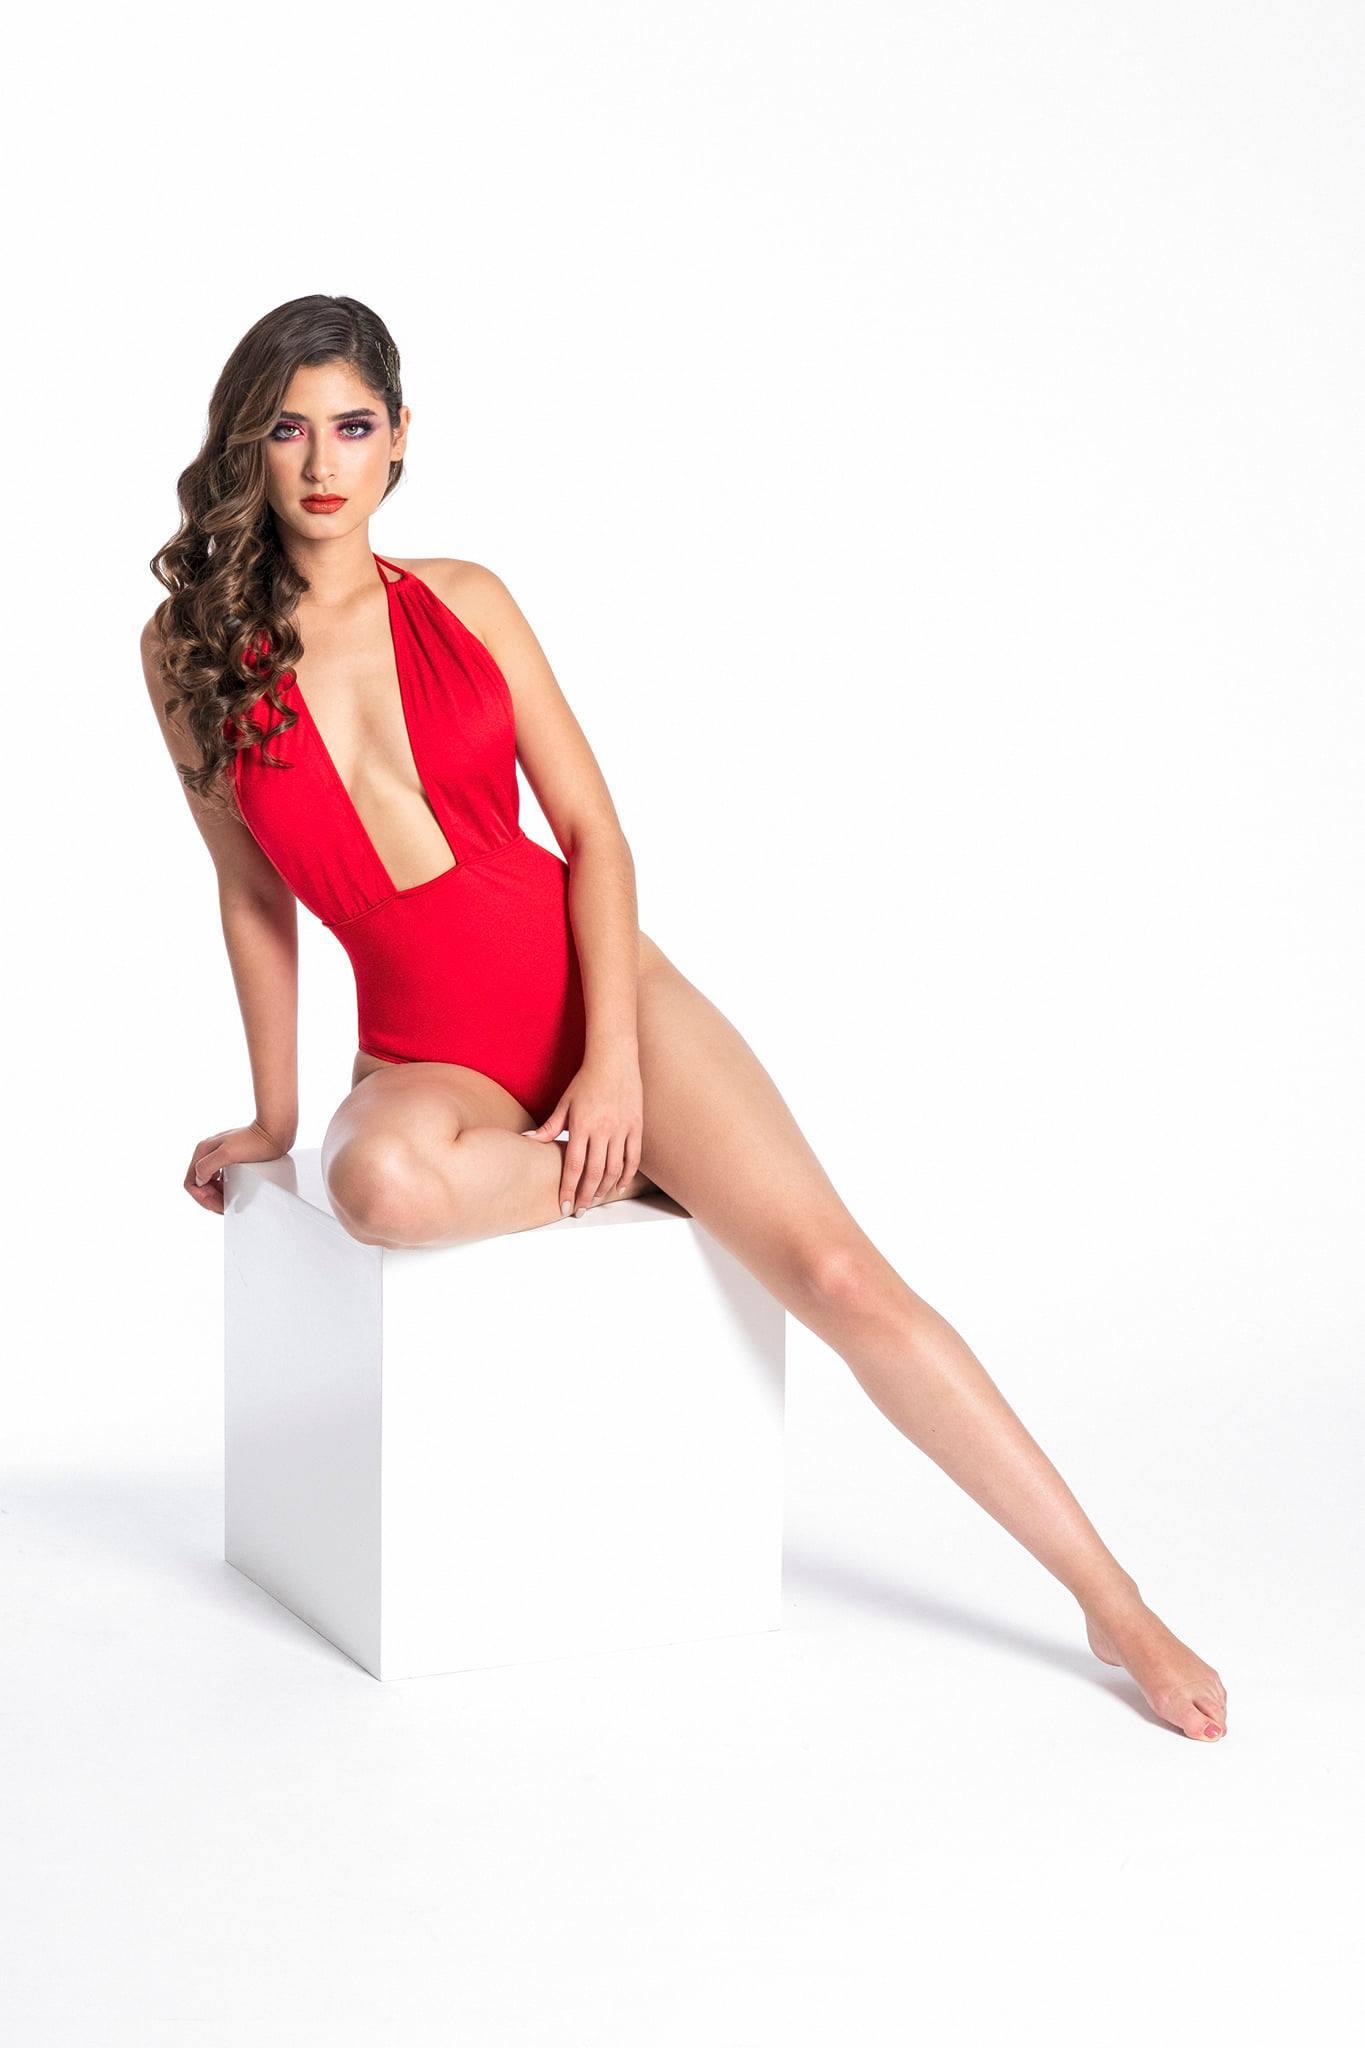 angela leon yuriar, miss grand mexico 2020. - Página 9 Pb3cz10